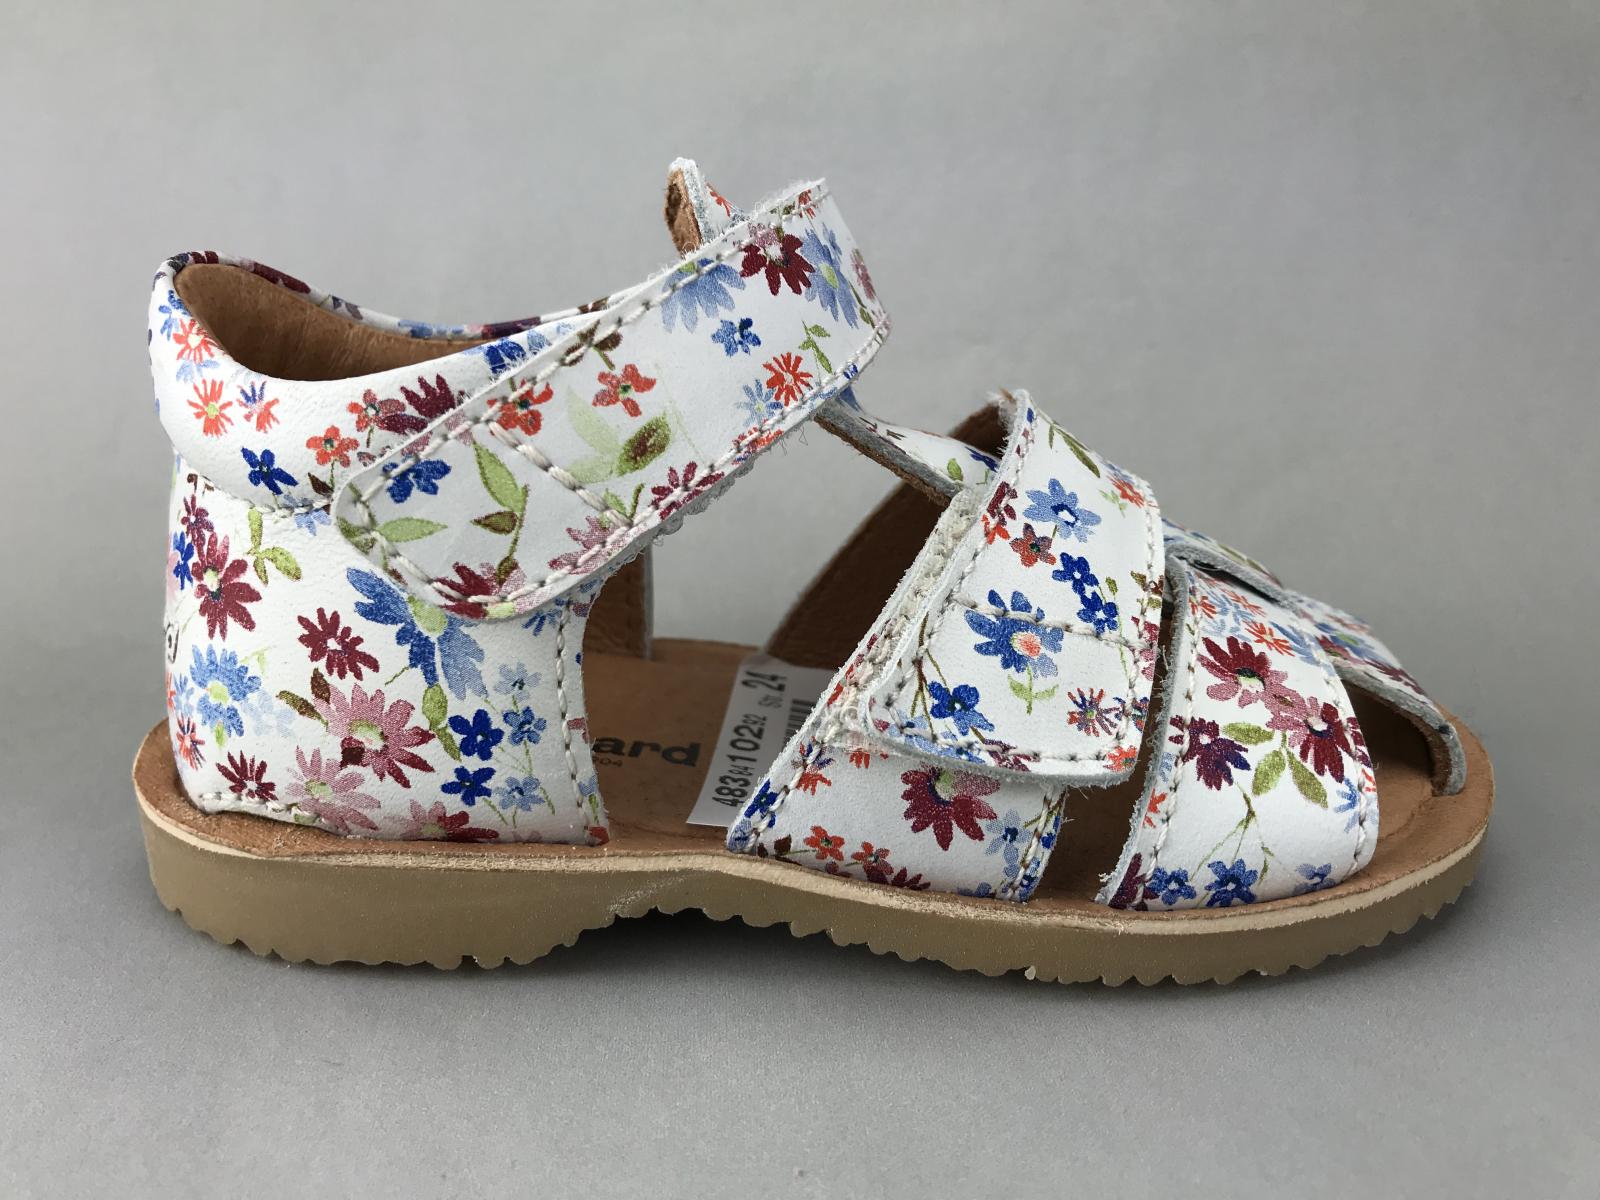 9ff07519ba17 Bundgaard pige sandal - hvid m. blomster - BØRN - zjoos-hjoerring.dk